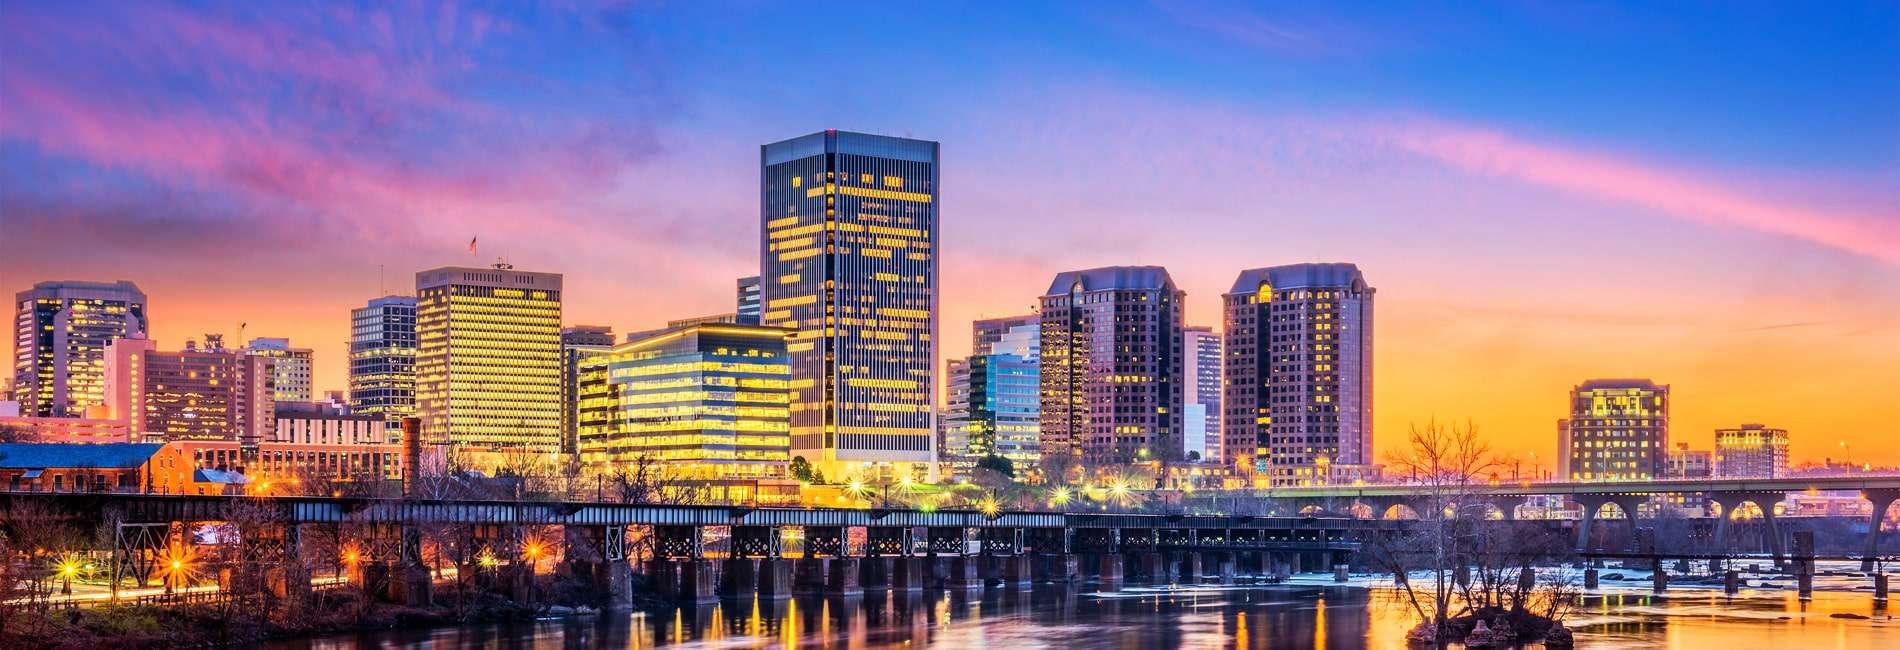 Richmond, Virginia skyline at dusk, the area Shogun professionals service